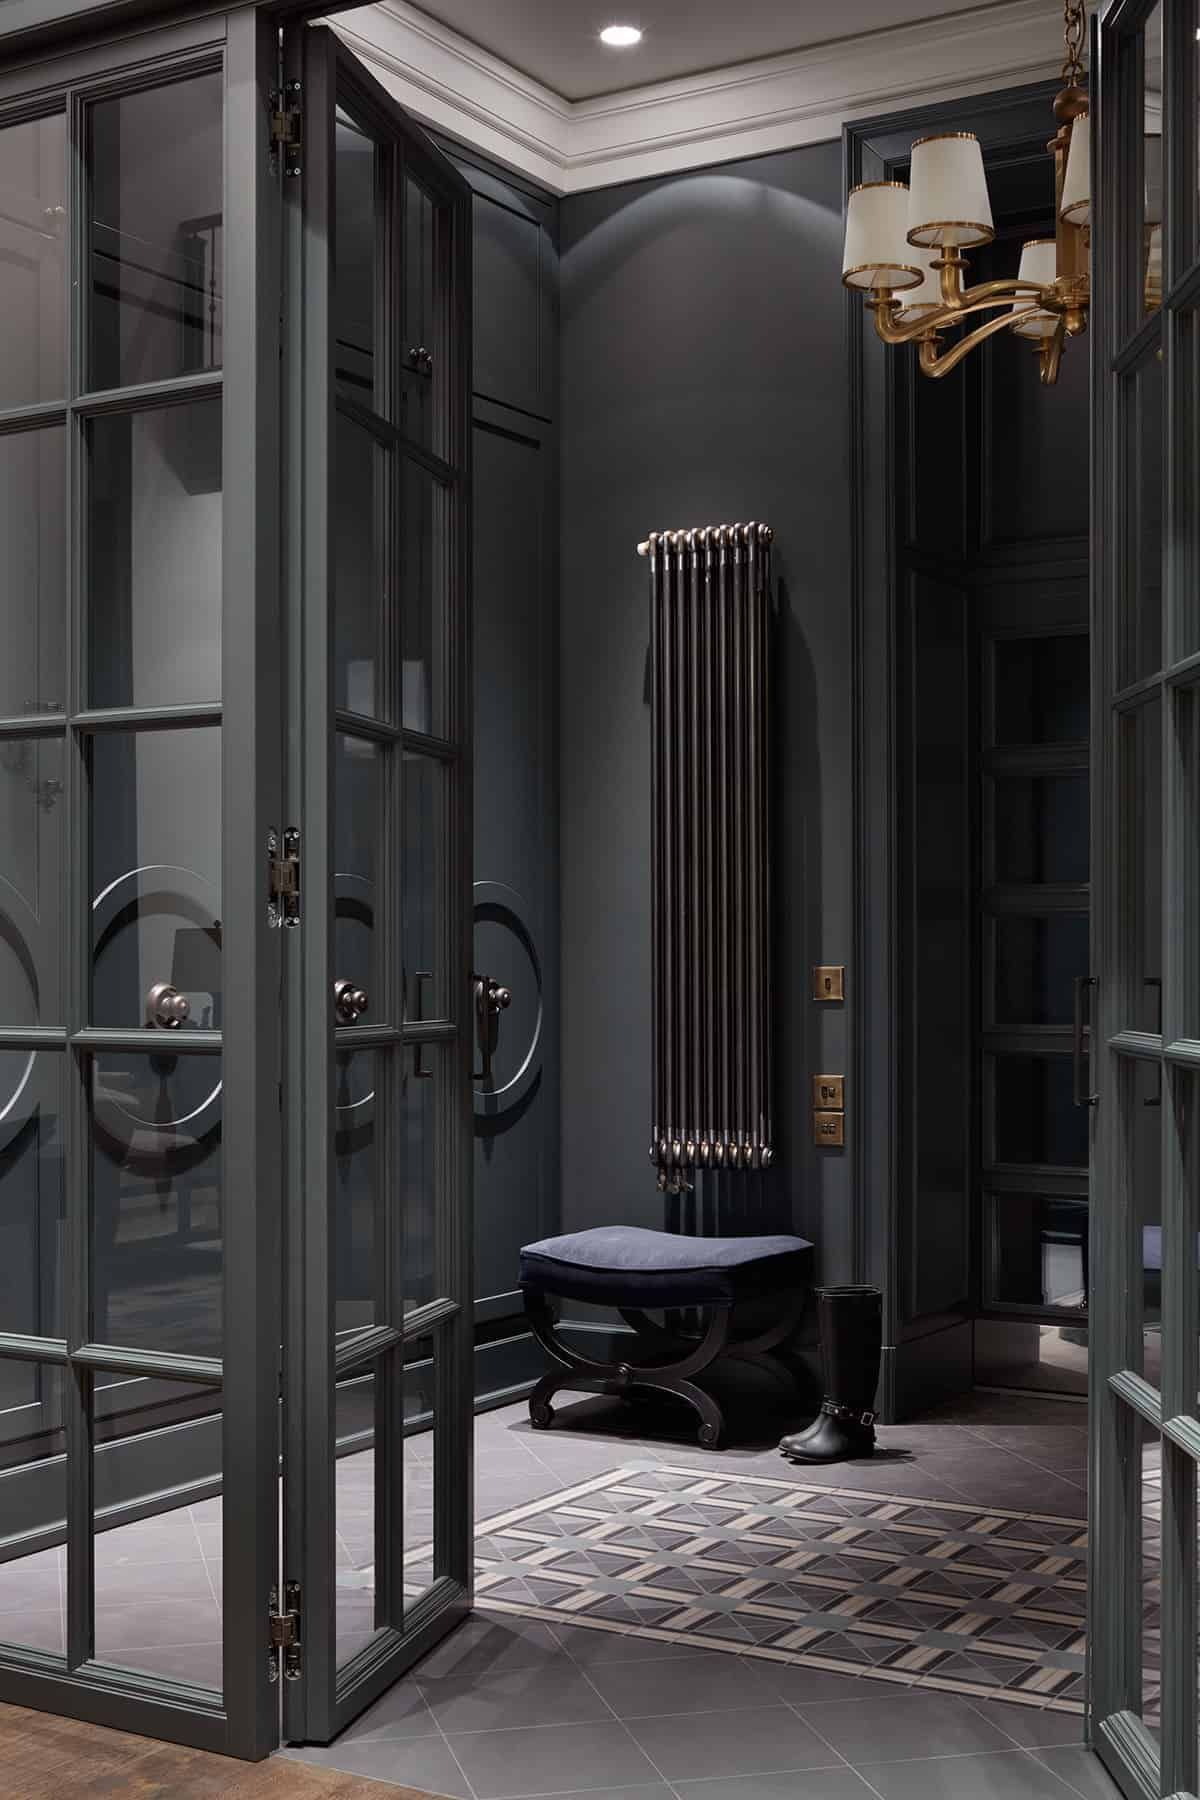 50 Traditional Style Foyer Ideas (Photos) #darkwalls